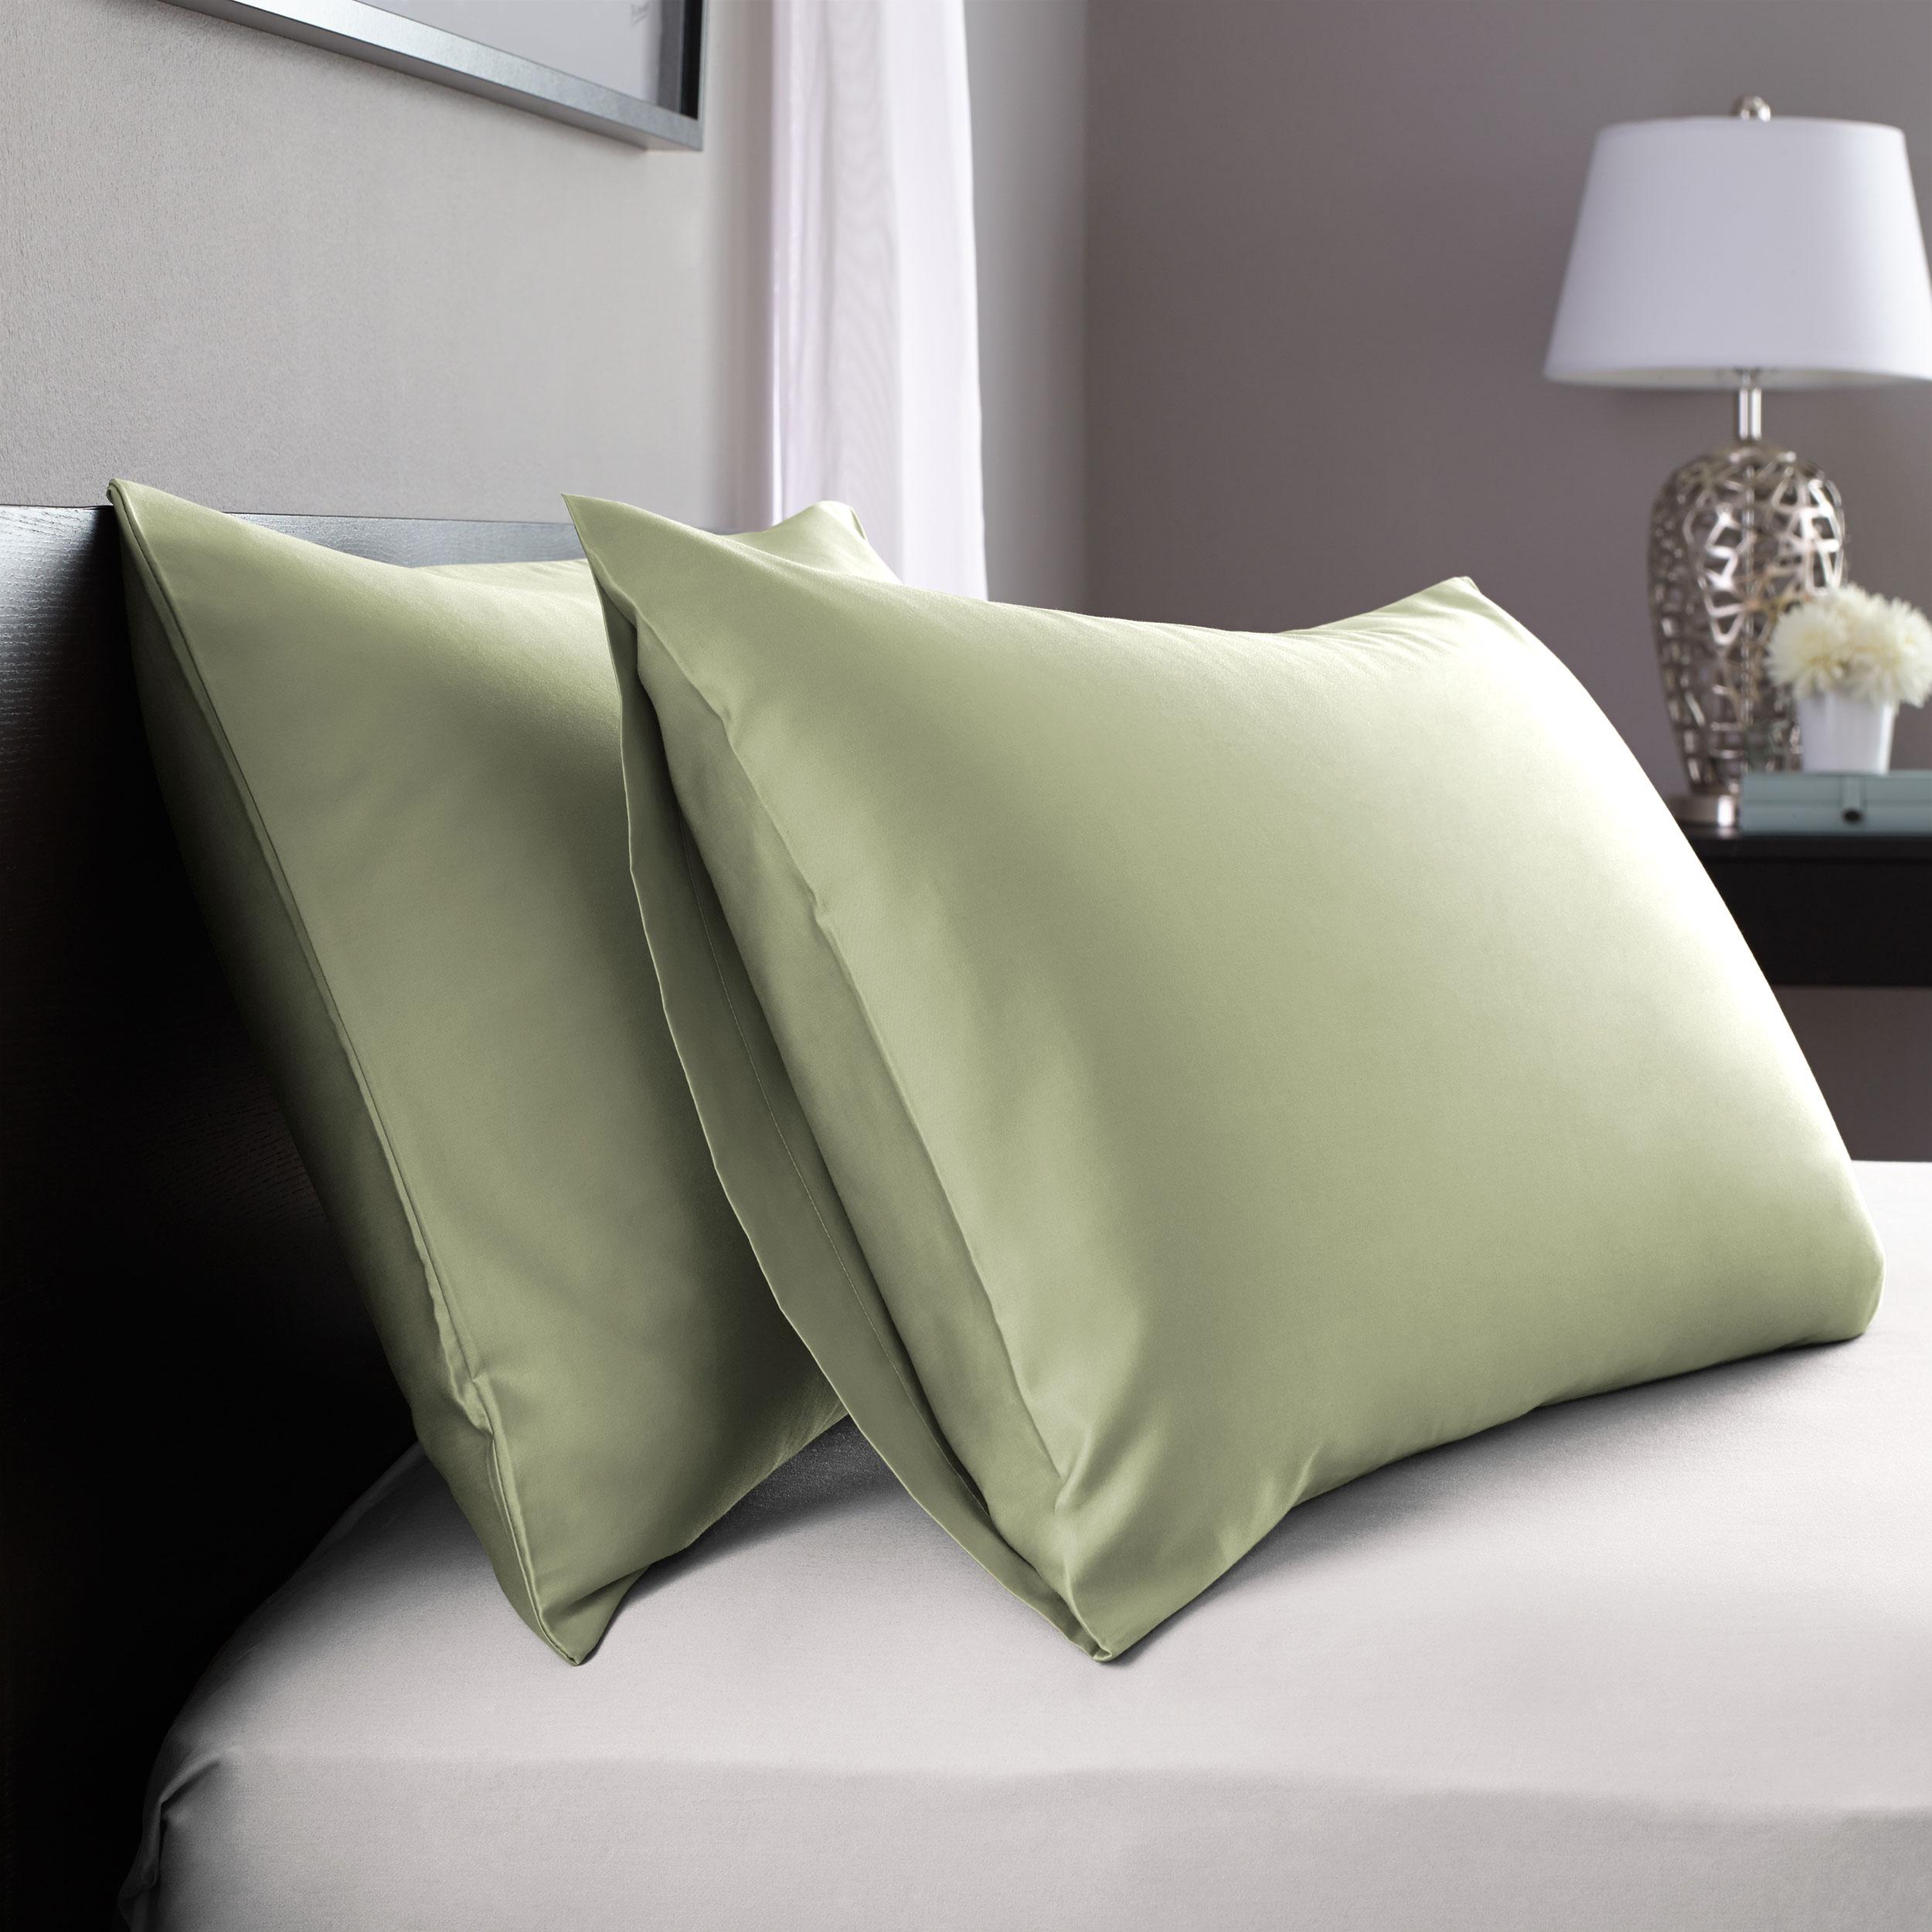 European Pillow Size Chart Pflag